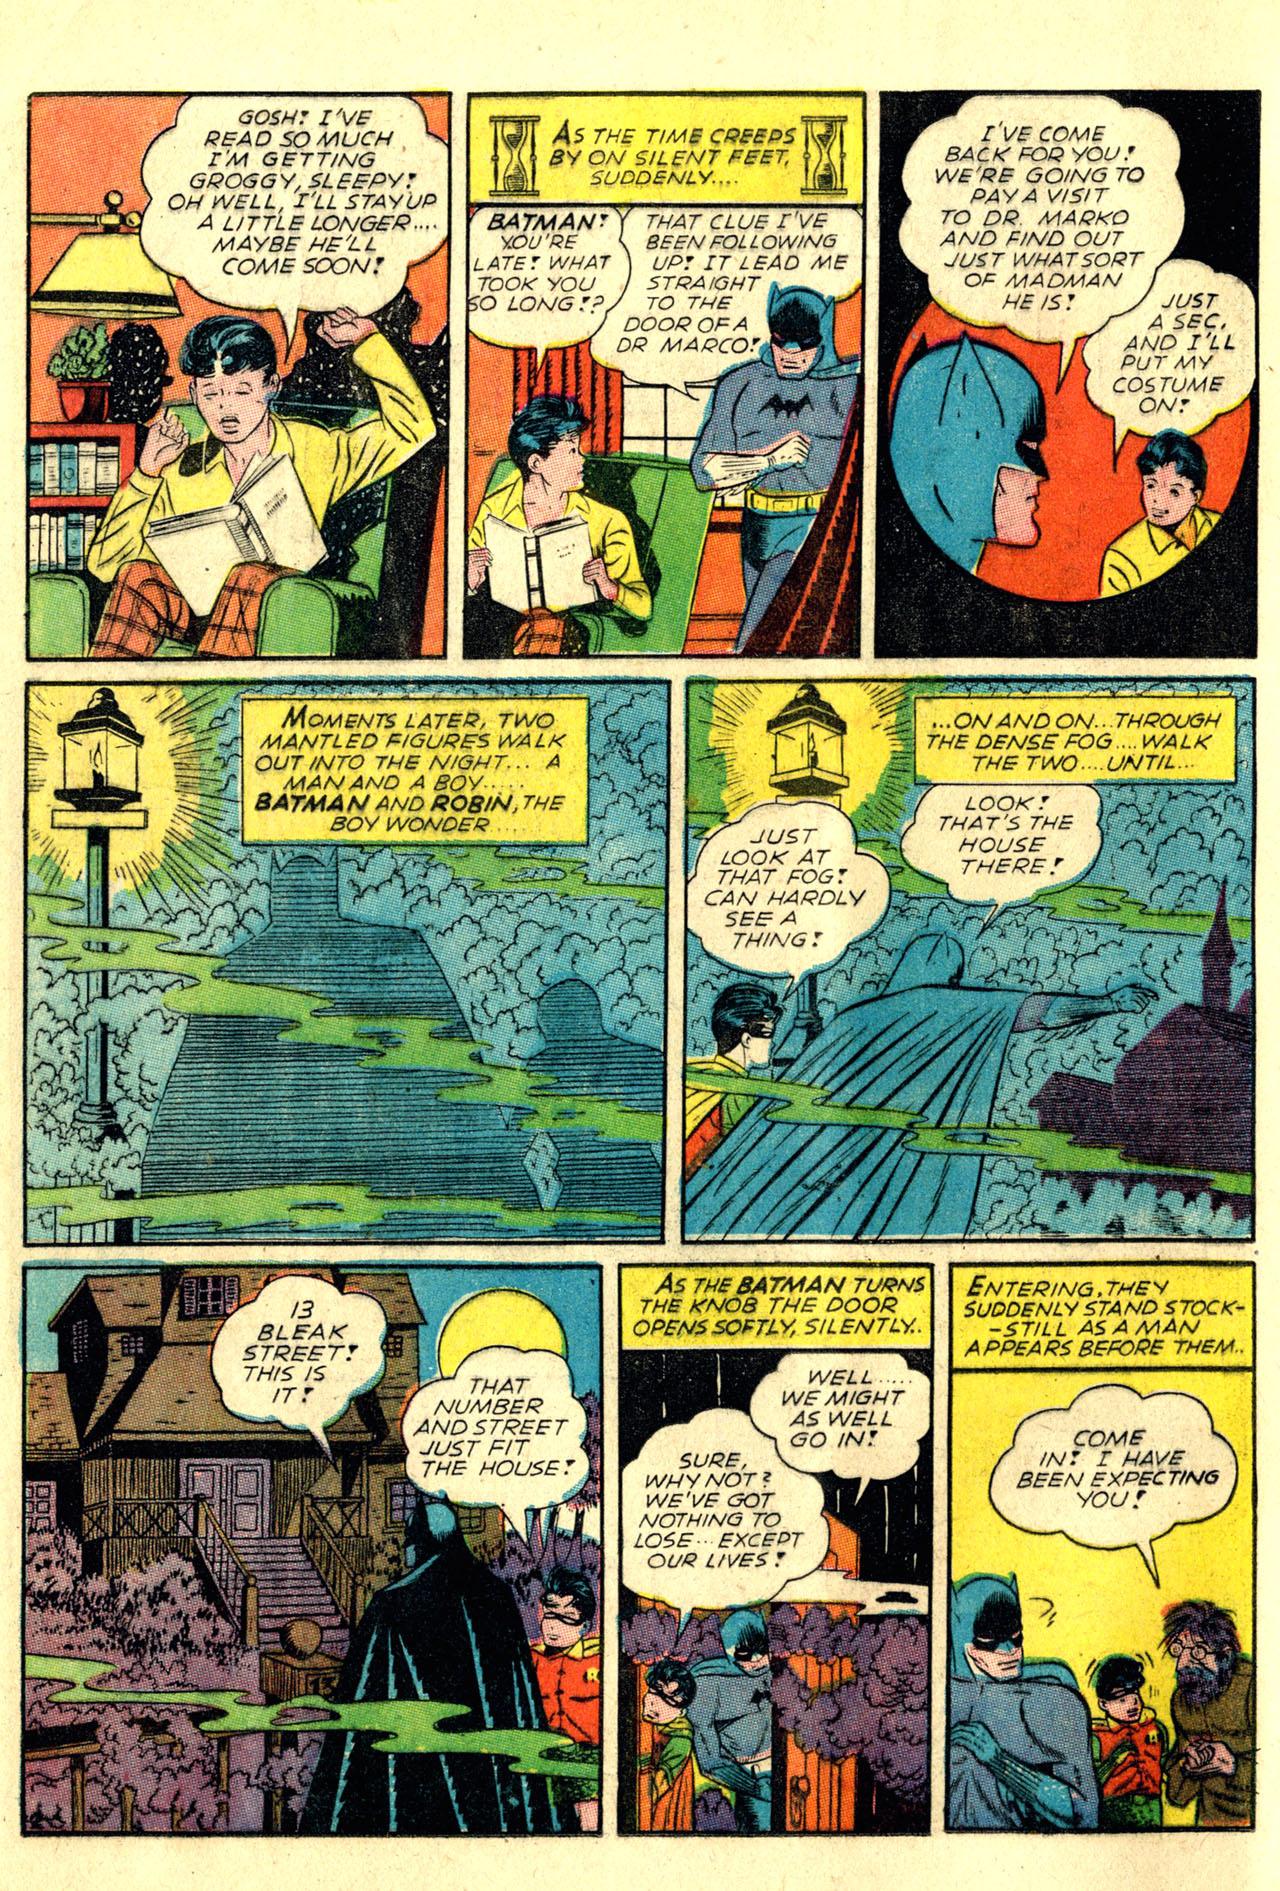 Read online Detective Comics (1937) comic -  Issue #44 - 4